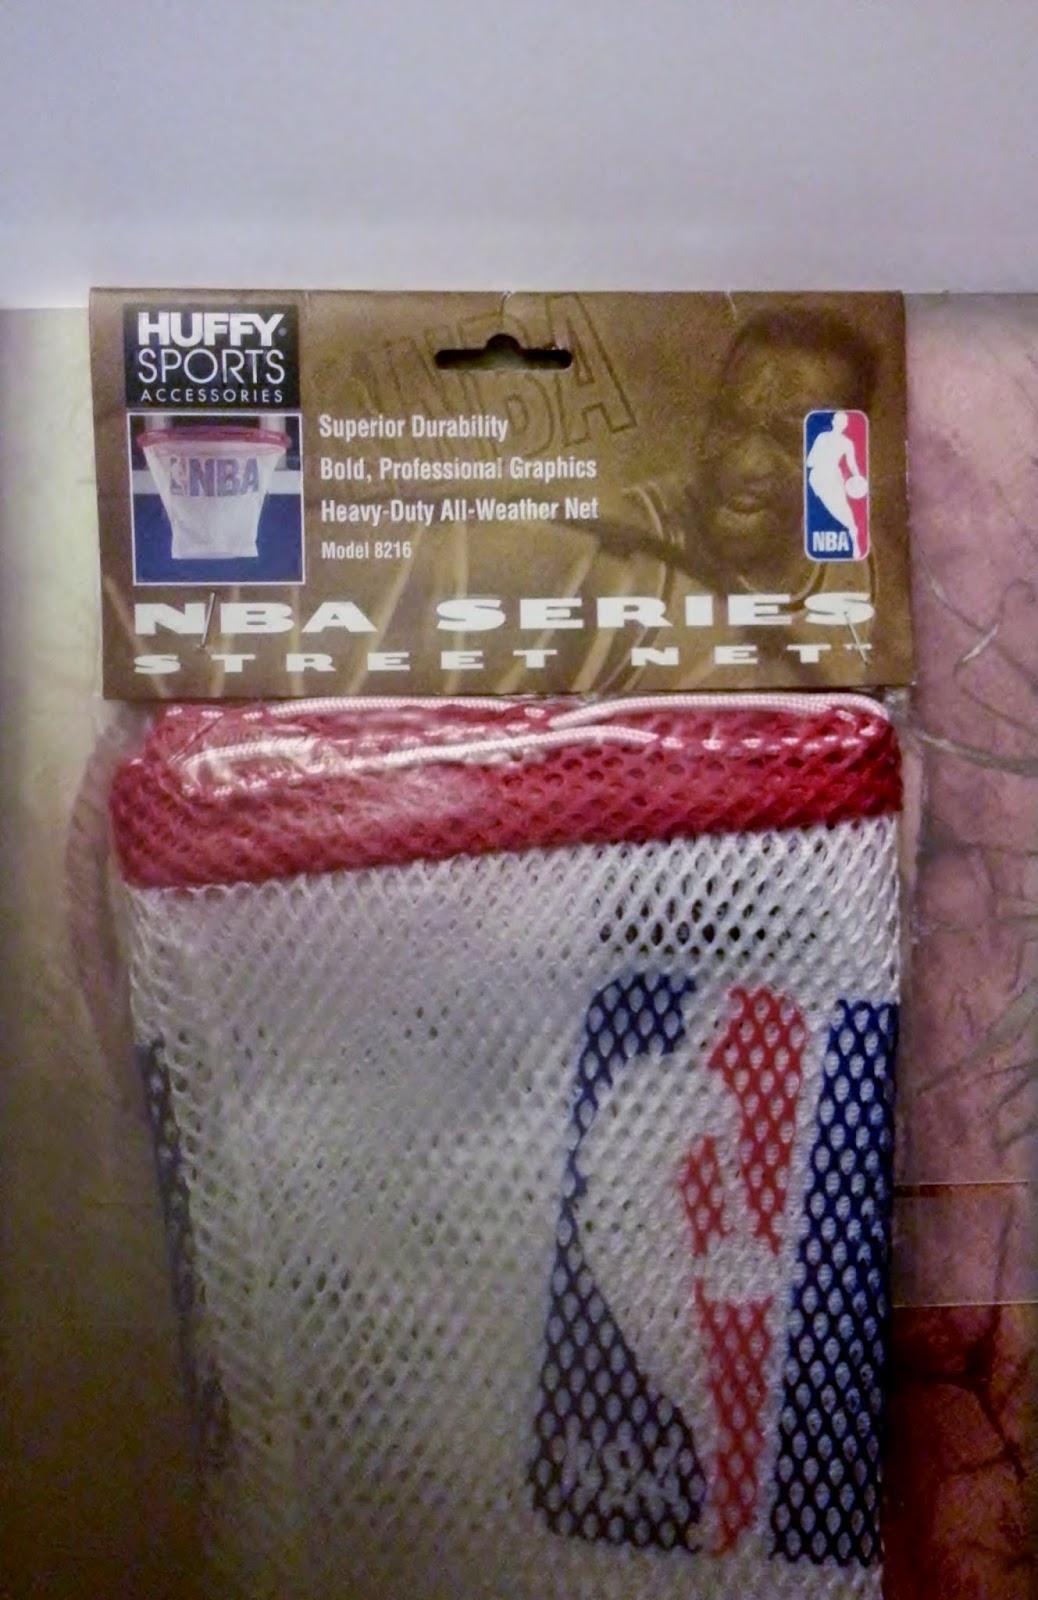 http://www.mymisi.com/gifts/1134768/huffy-sports-basketball-superior-durability-heavy-duty-all-weather-rim-hoop-backboard-nba-series-street-net#.VQFC-YVAsHU.blogger